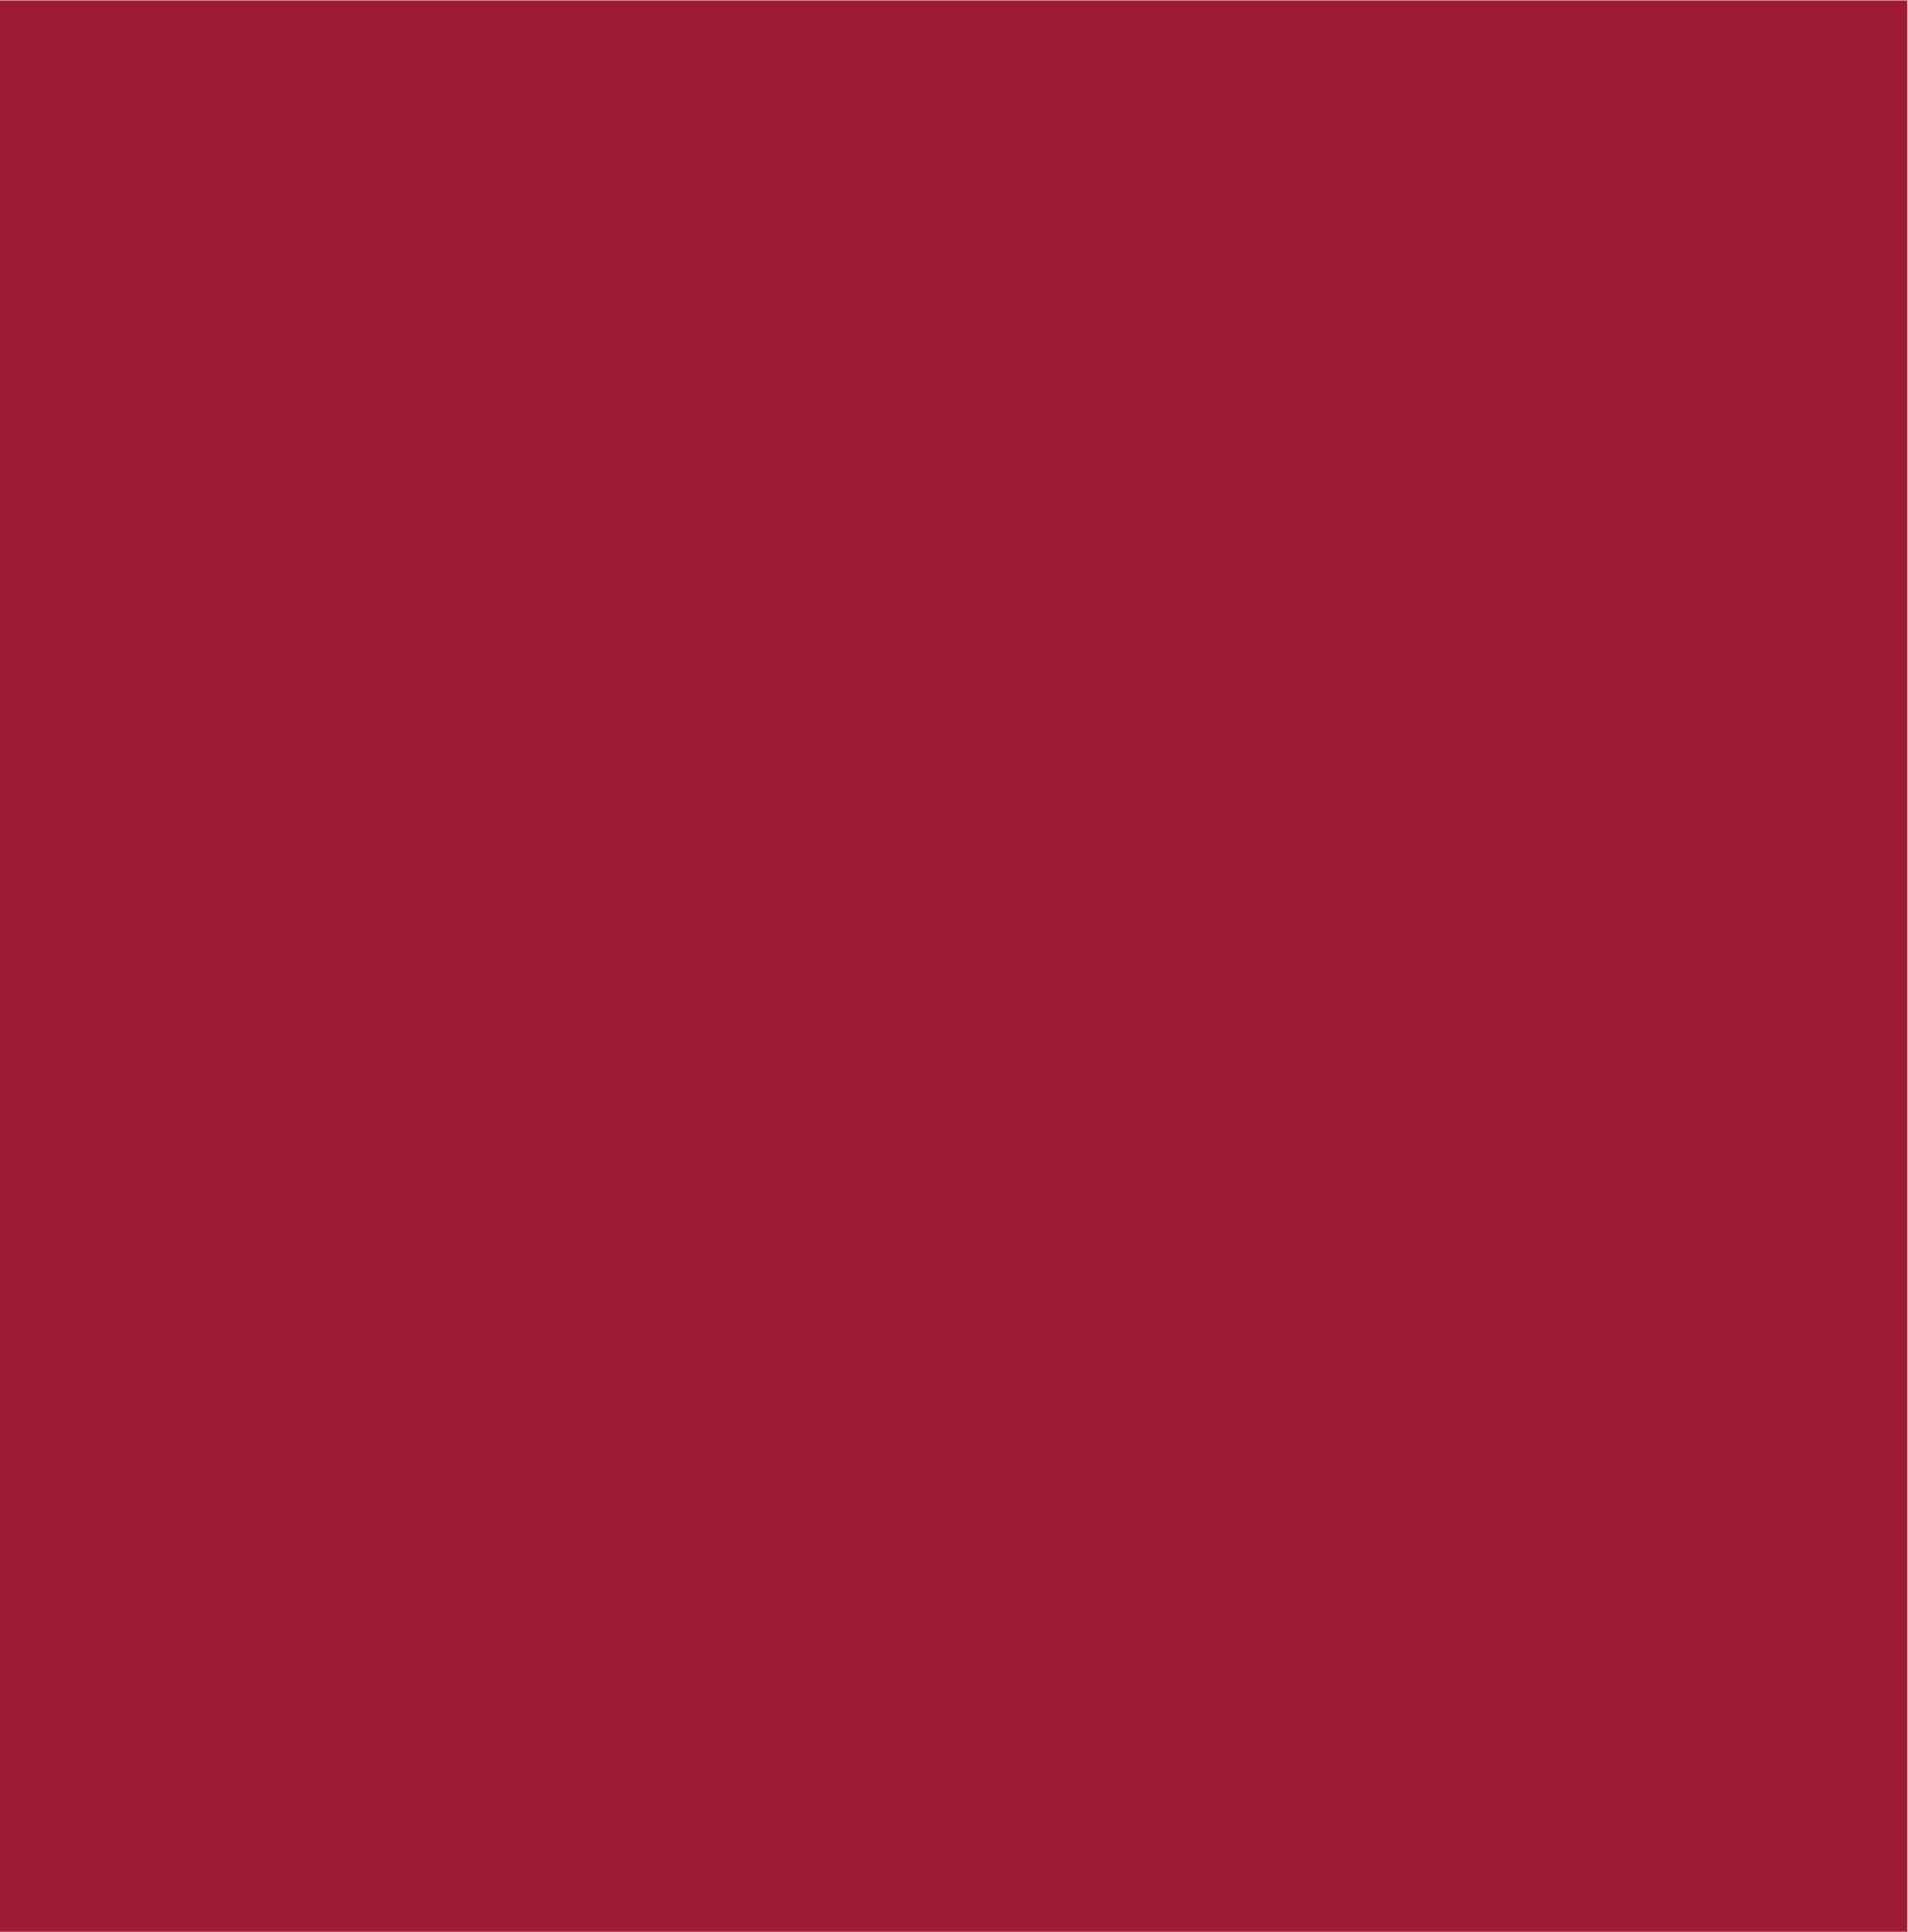 Sample of BYUH crimson